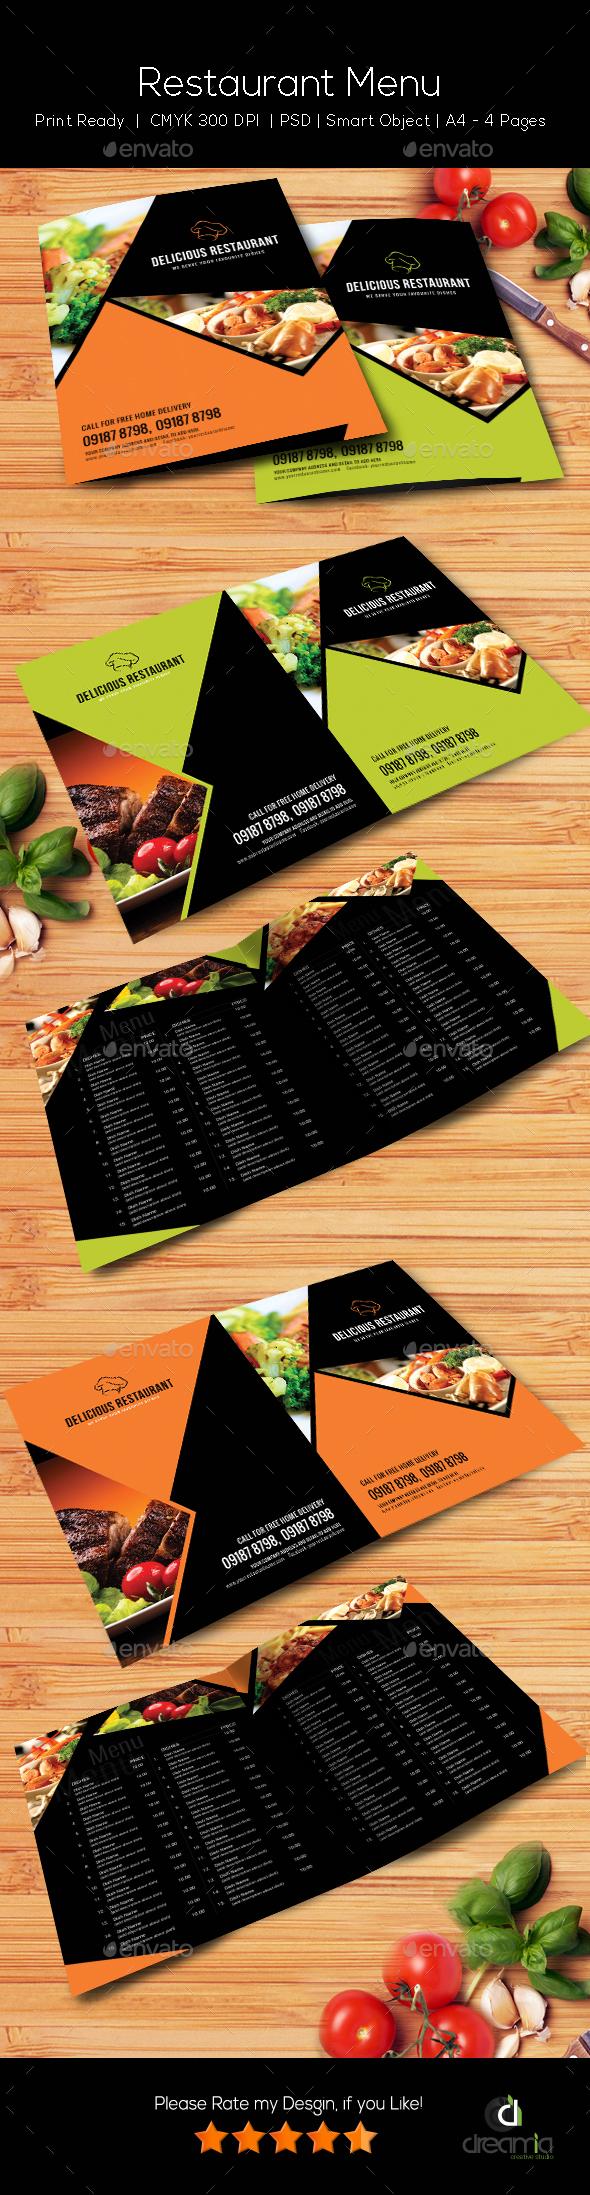 Restaurant Menu Template - Vol4